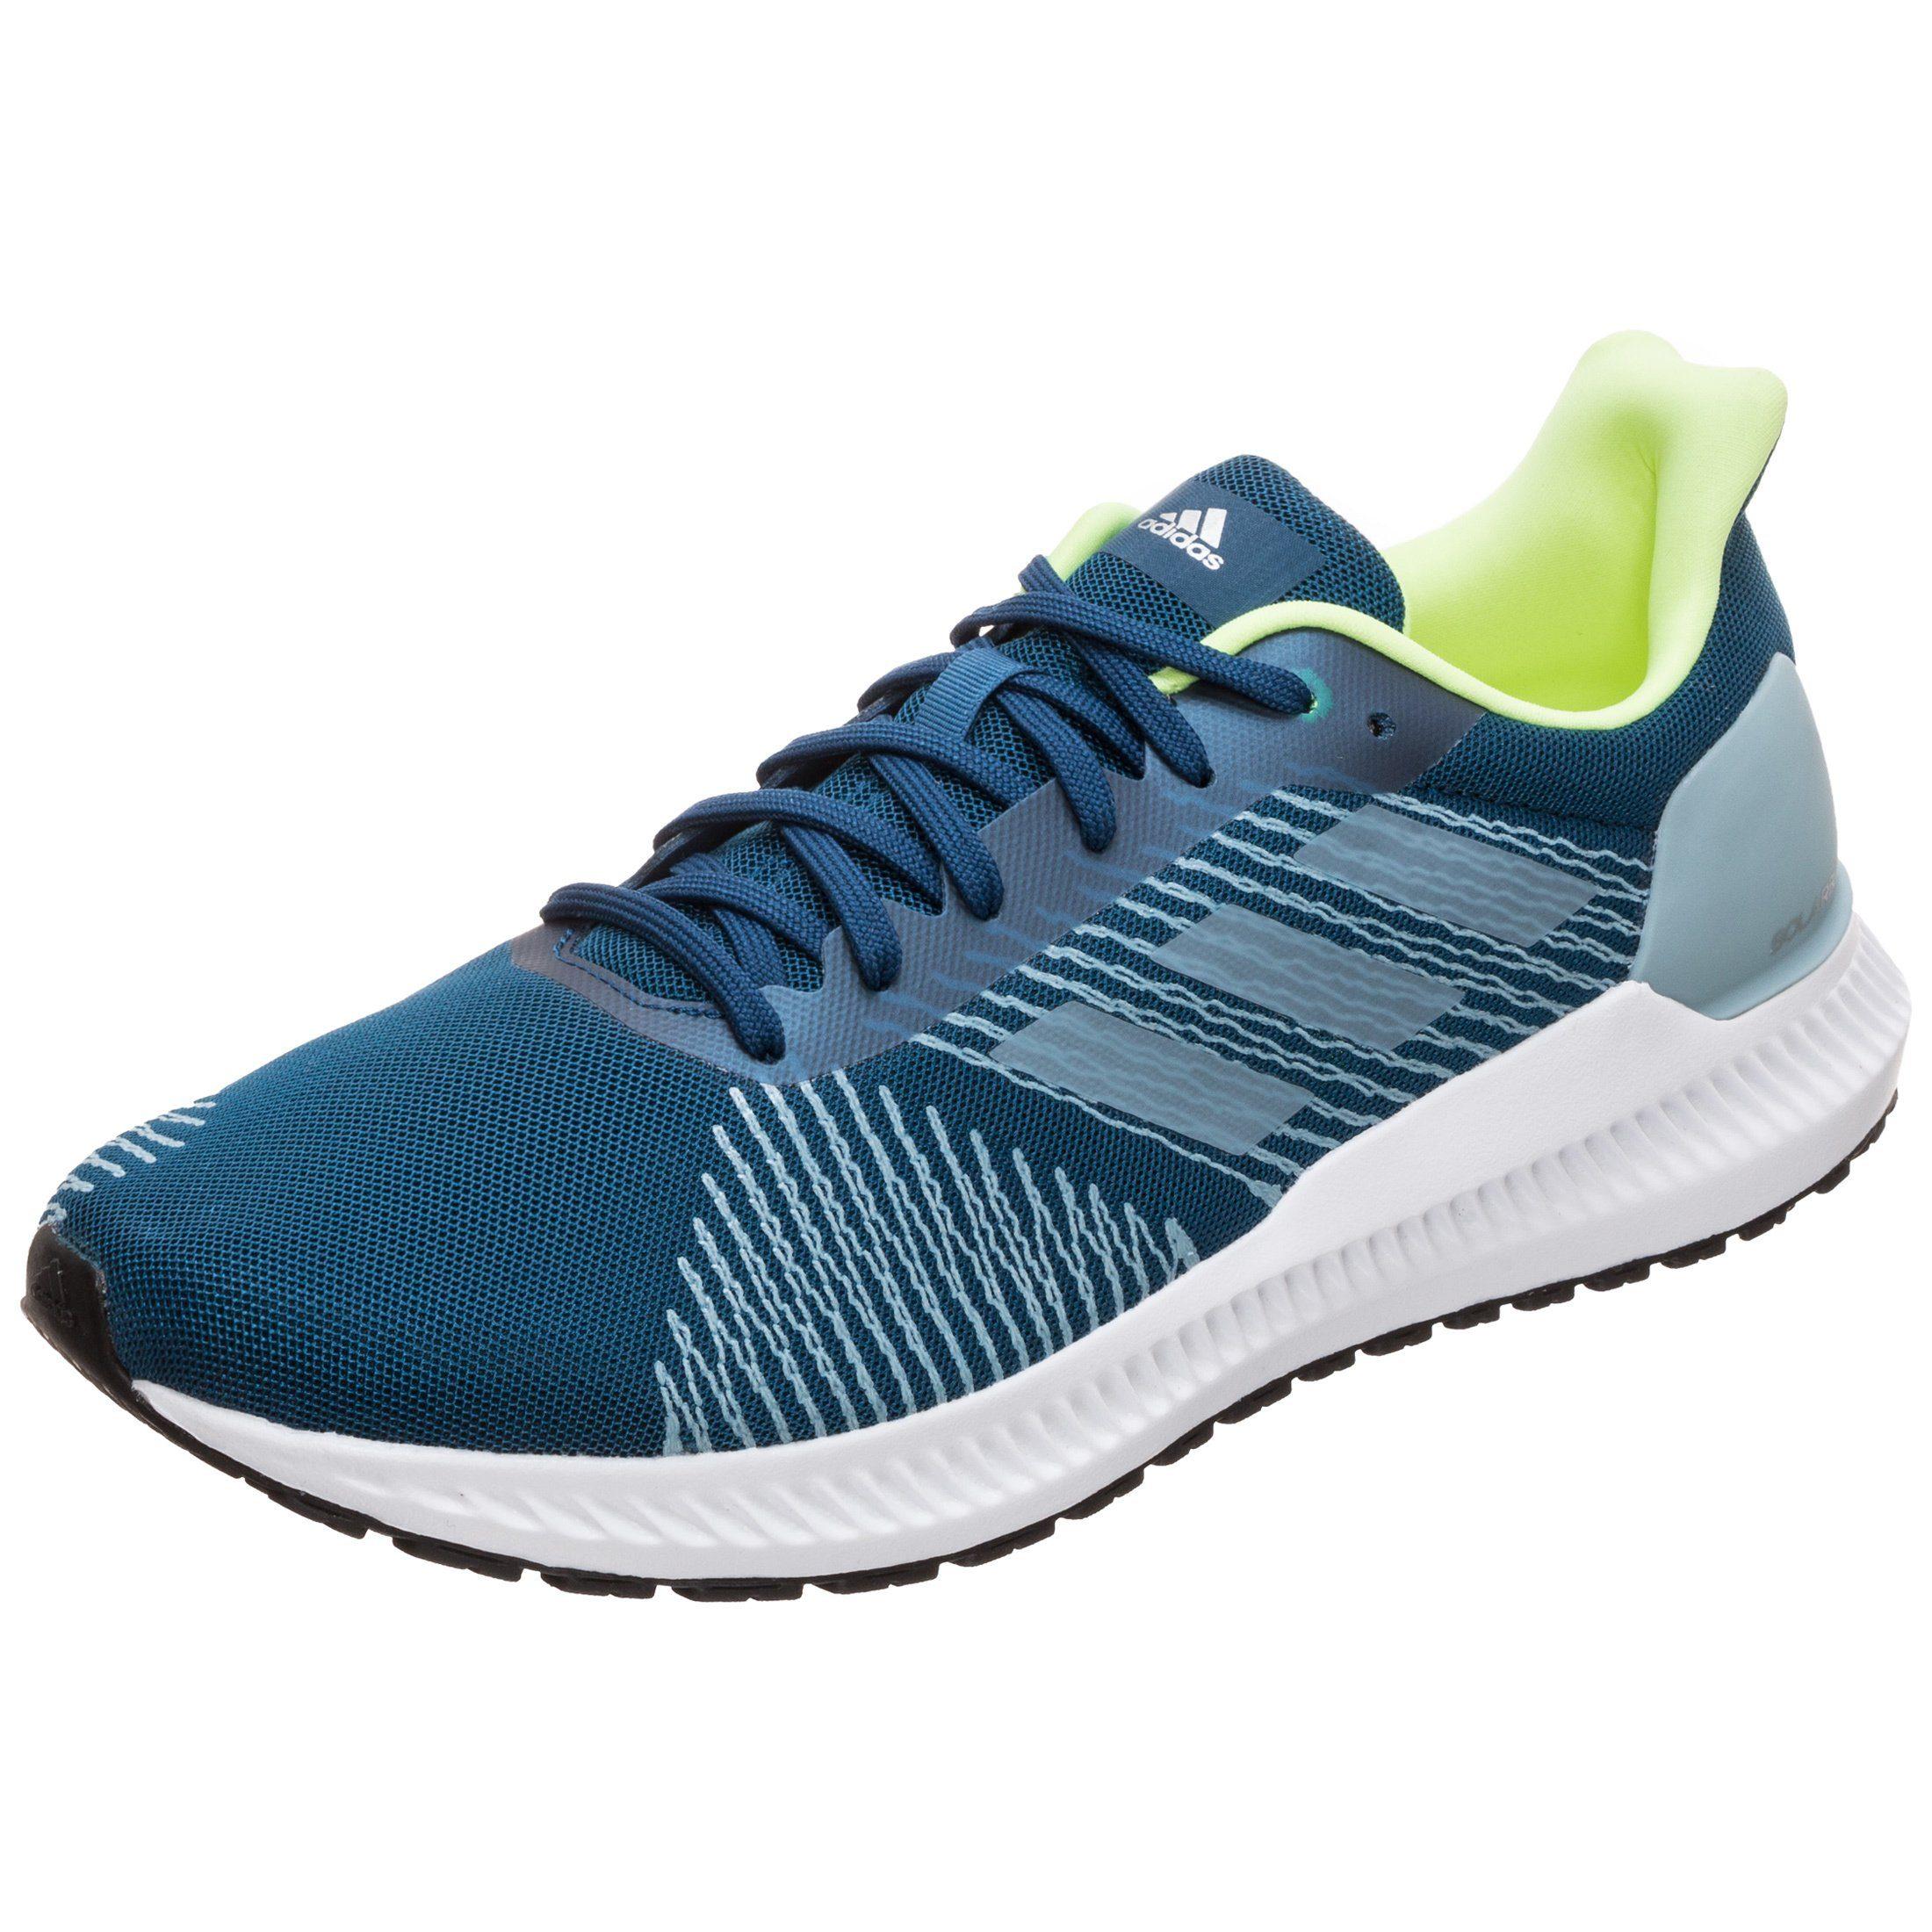 adidas Performance Laufschuh Solar Blaze | Schuhe > Sportschuhe > Laufschuhe | Blau | Adidas Performance